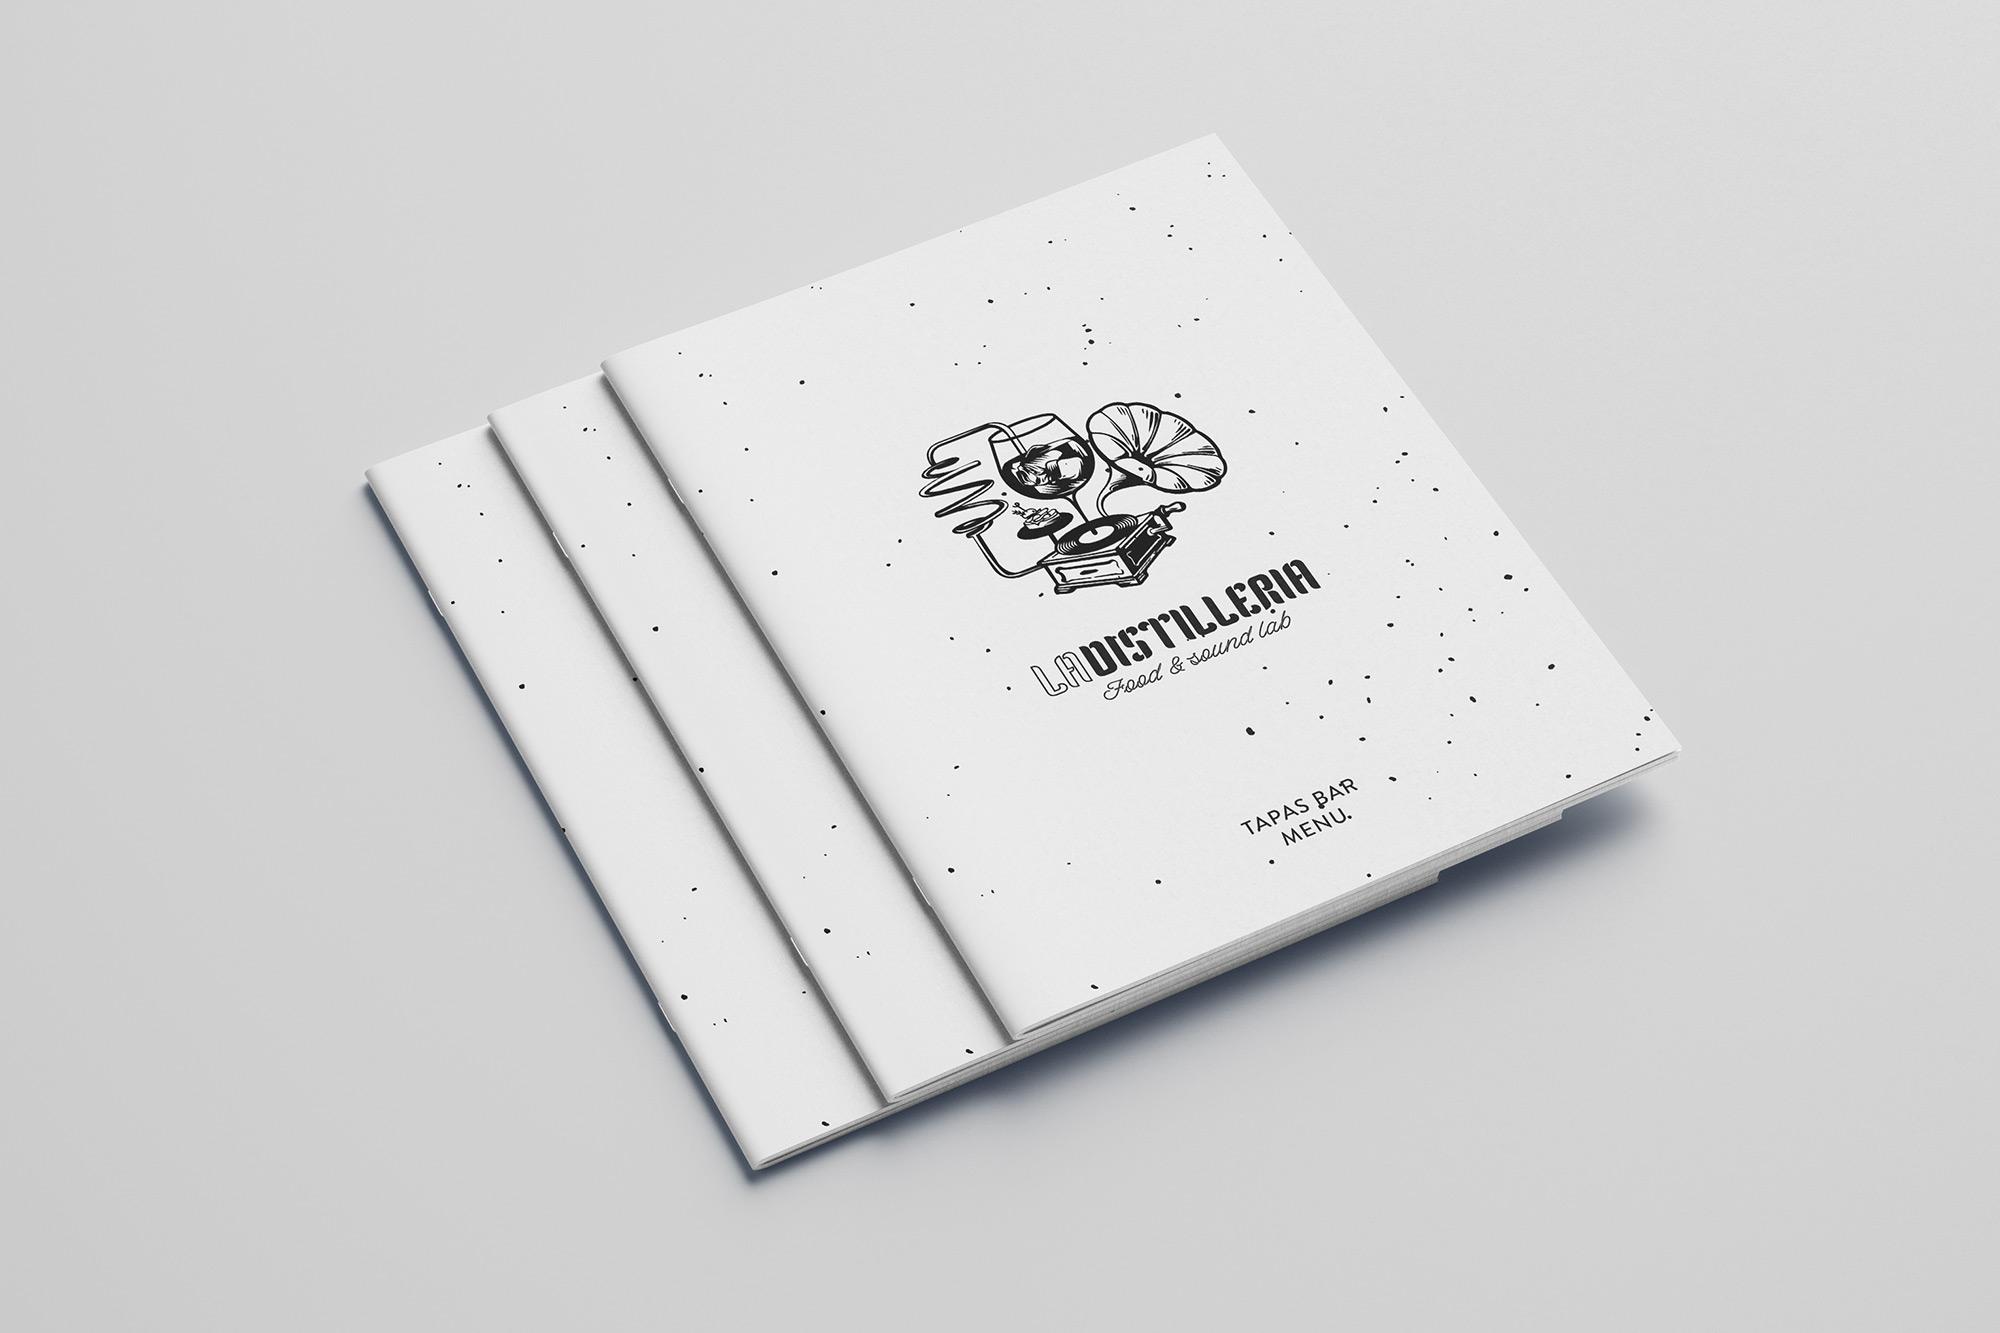 La Distilleria - Food & Sound Lab - logo, branding - img 5